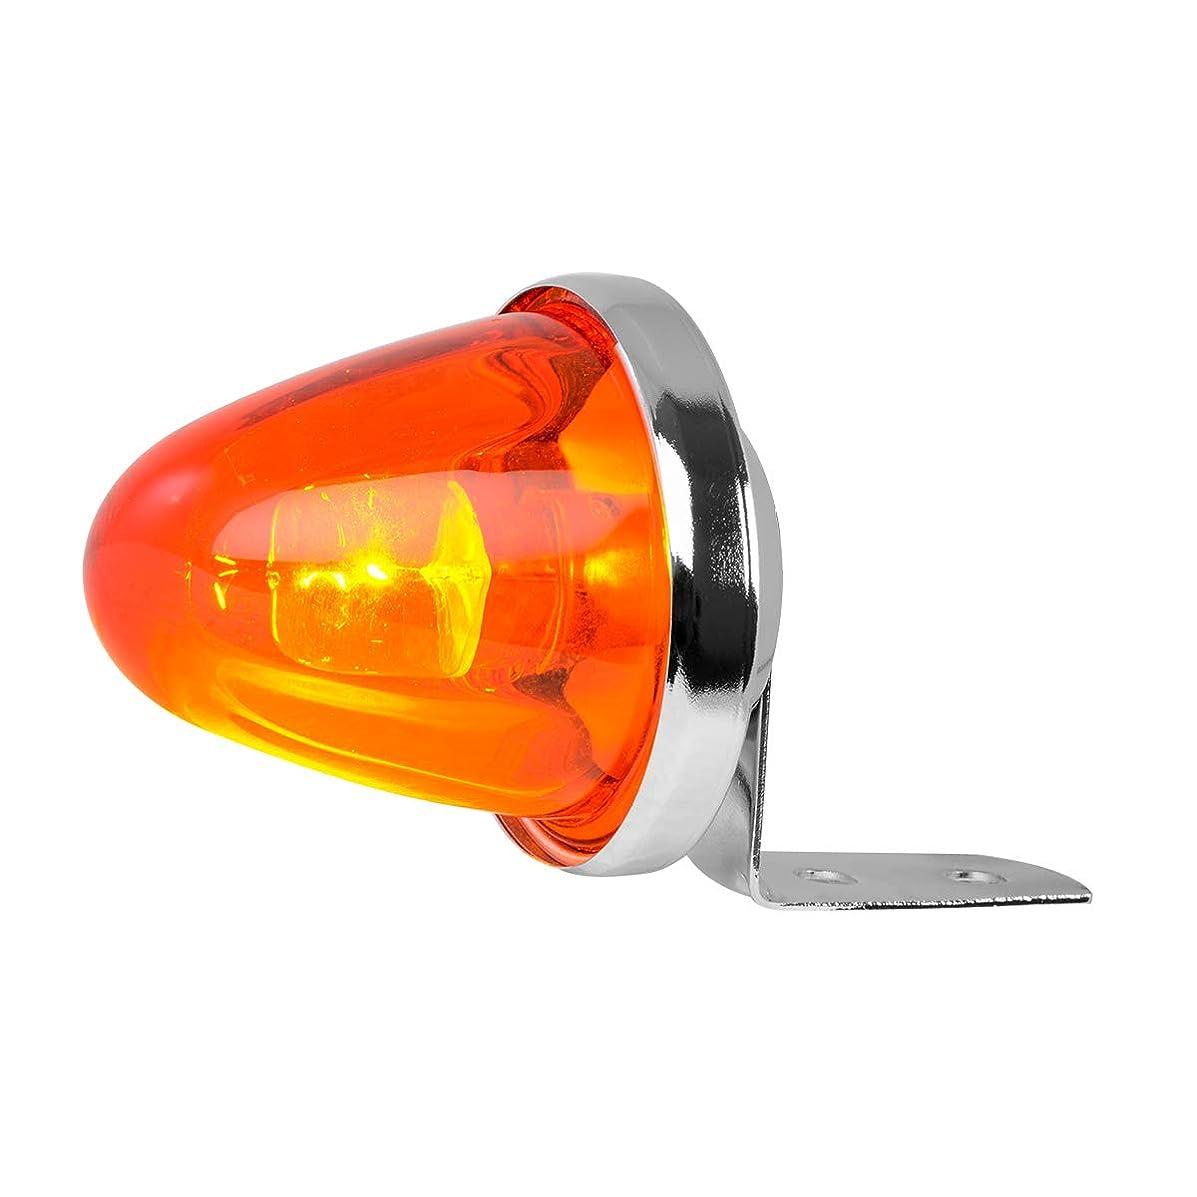 GG Grand General 84200 Marker Light (Beehive Amber Glass)